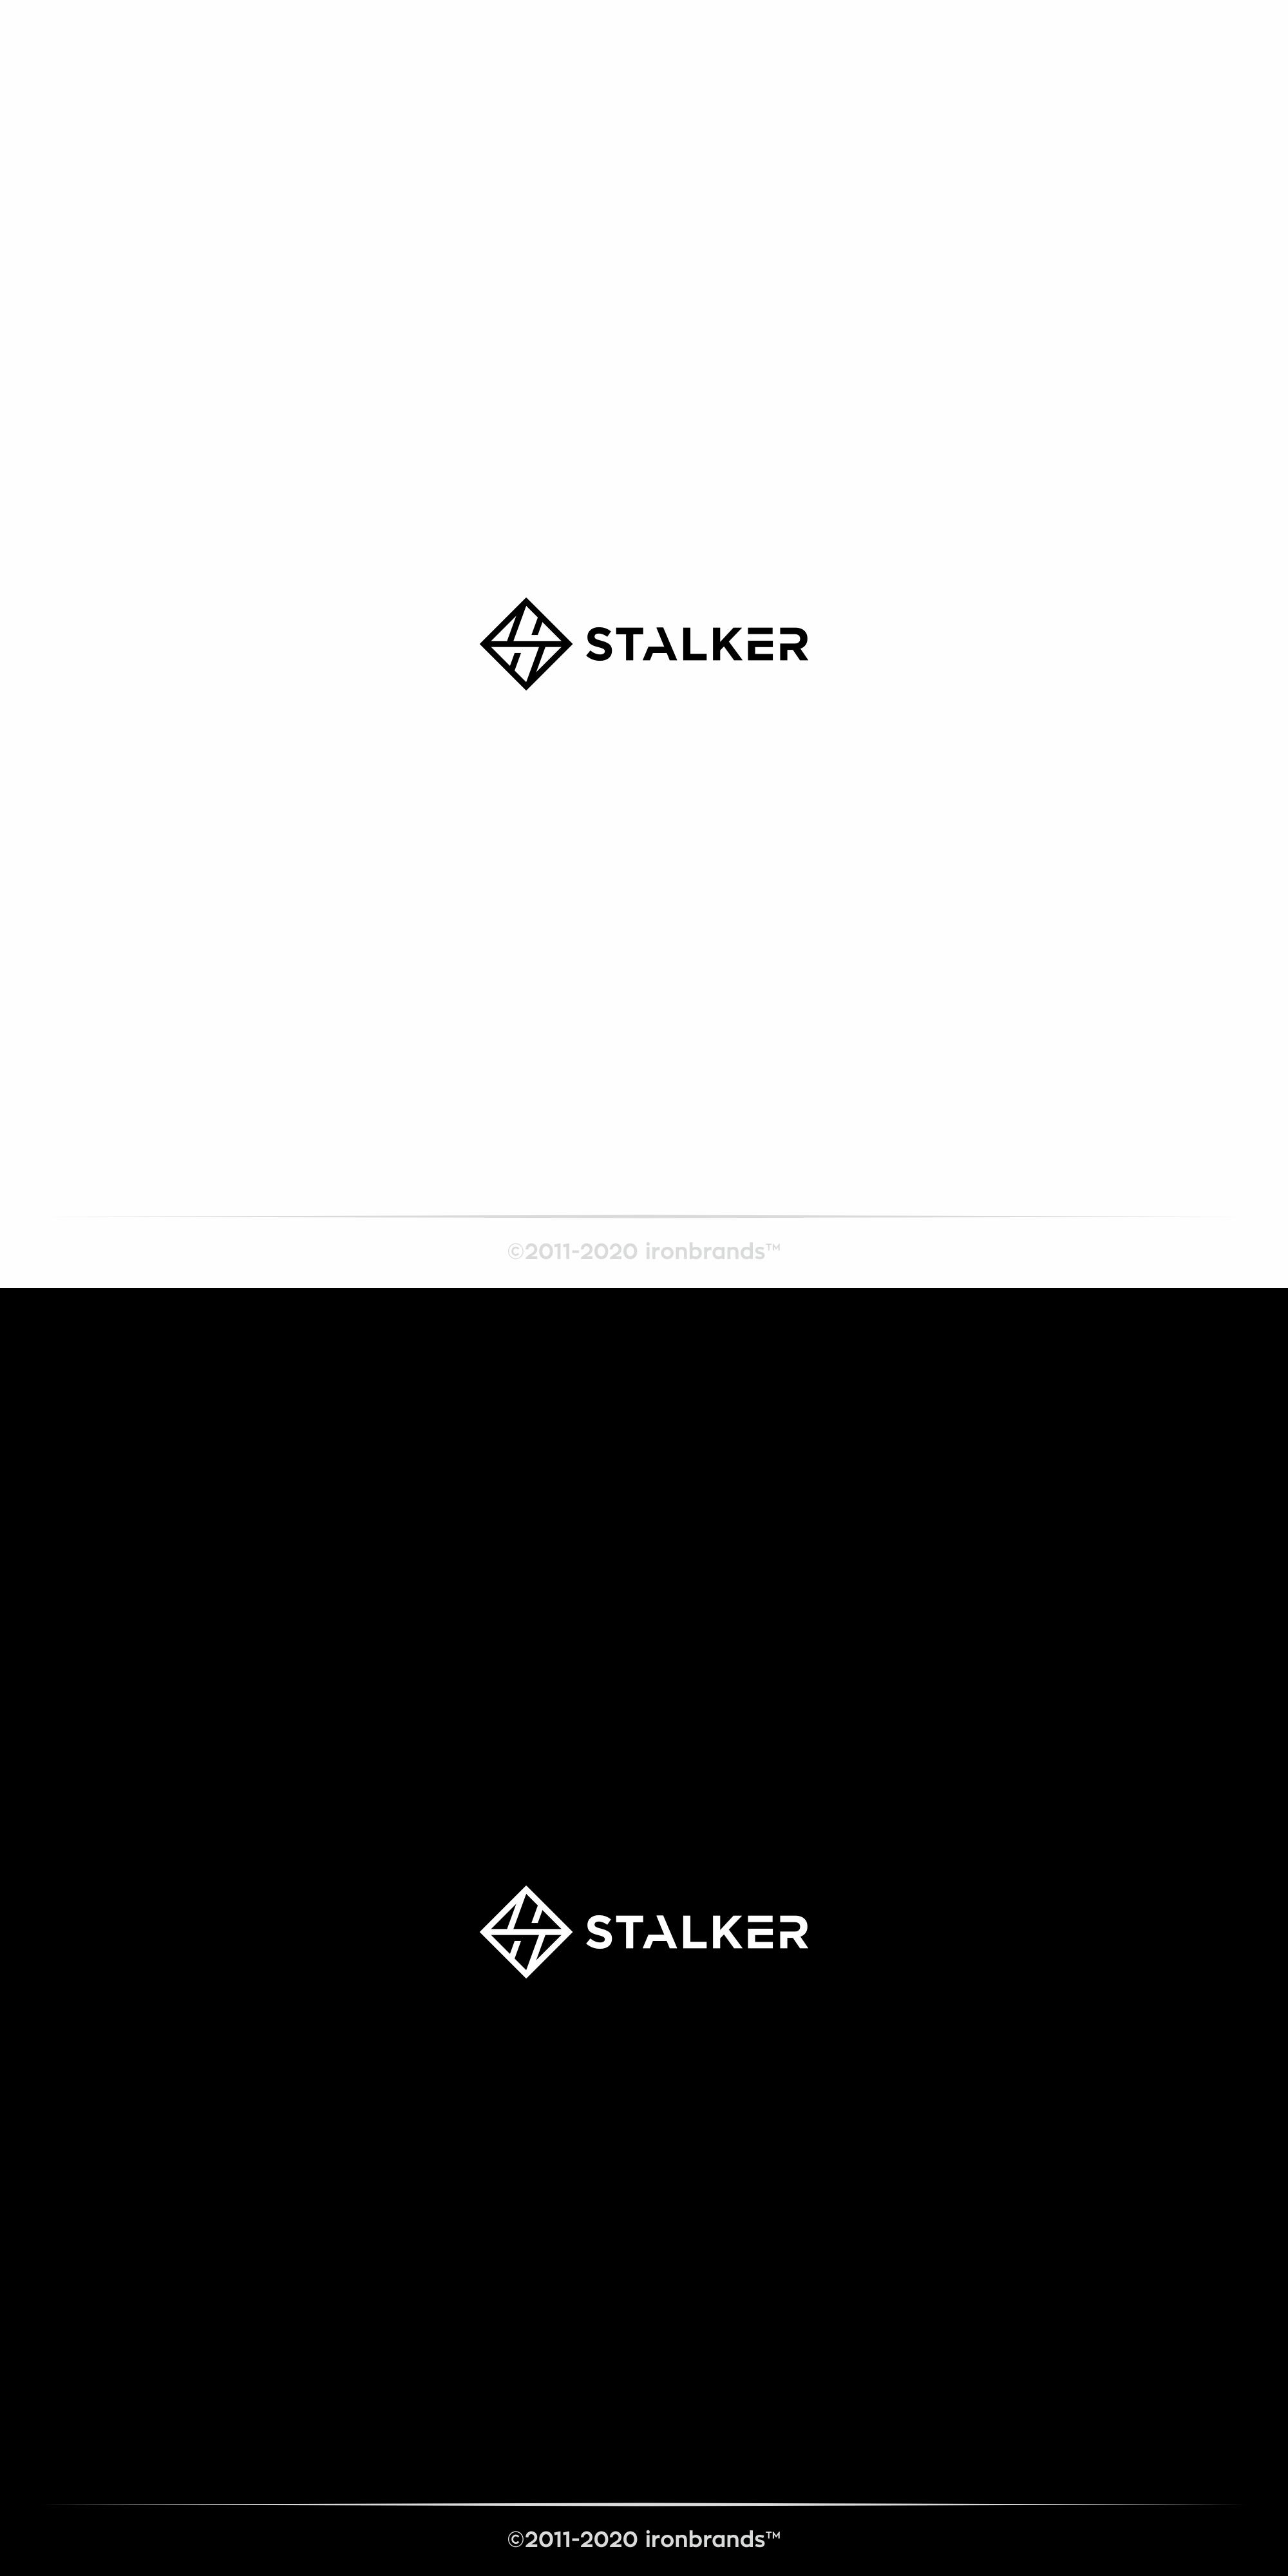 Разработать логотип для вездехода фото f_2755f8fe7c0bb162.jpg